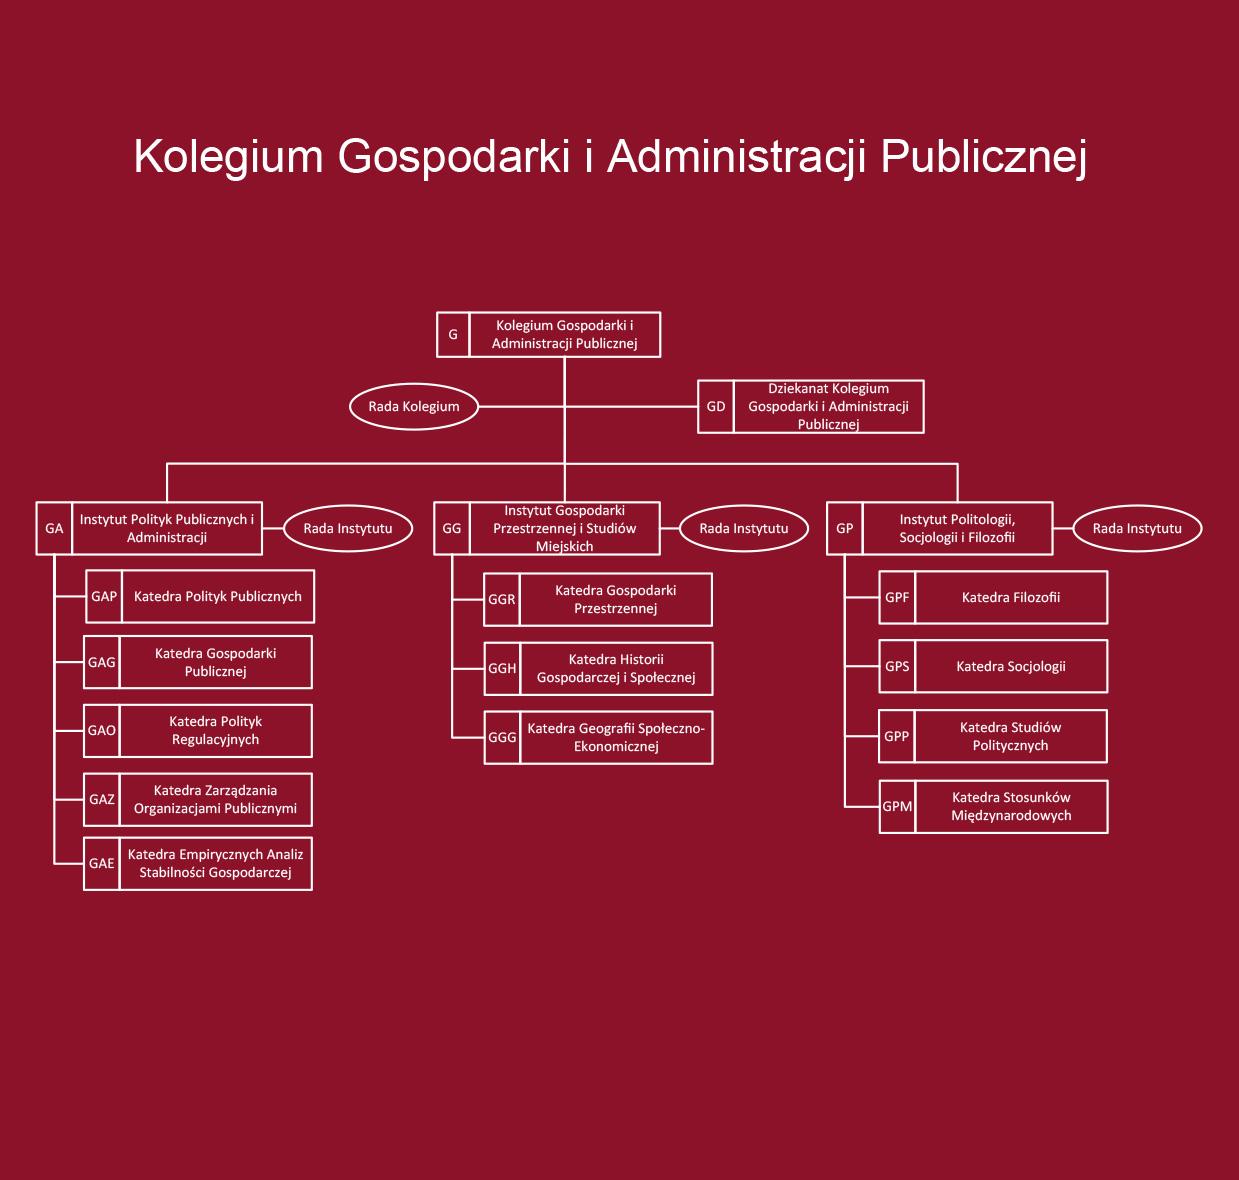 kolegium-gospodarki-i-administracji-publicznej